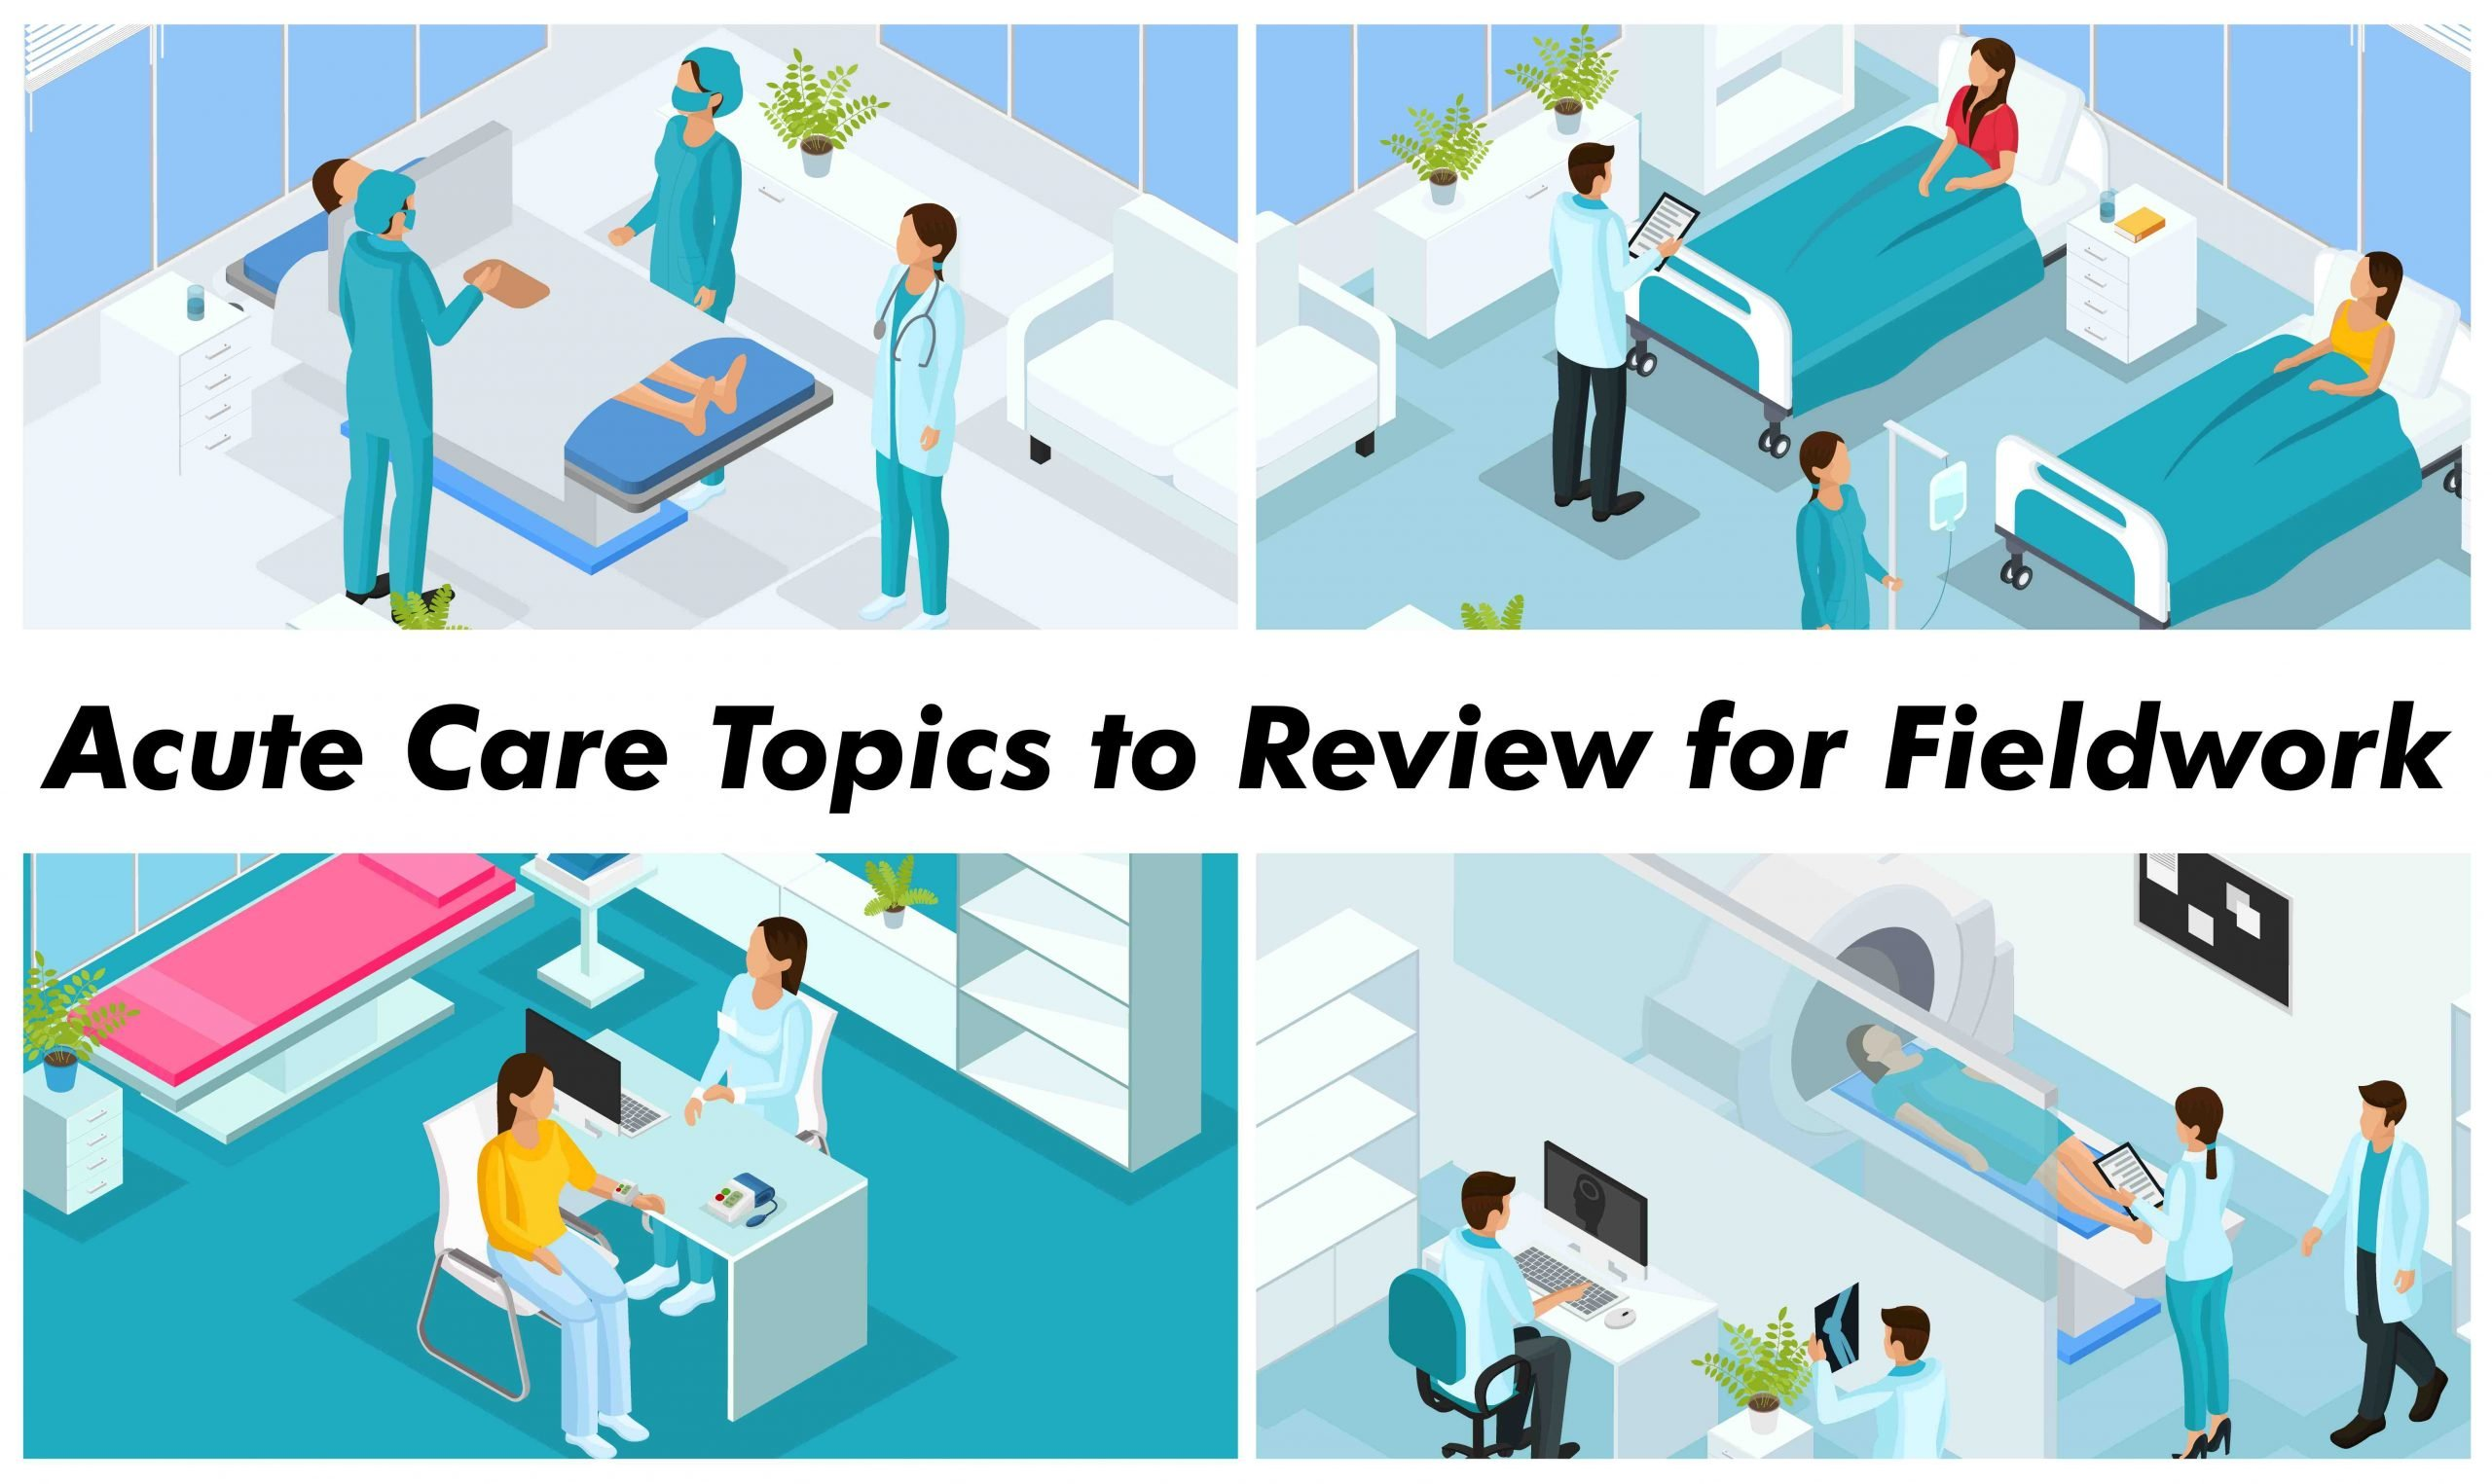 Acute Care Topics Review Fieldwork